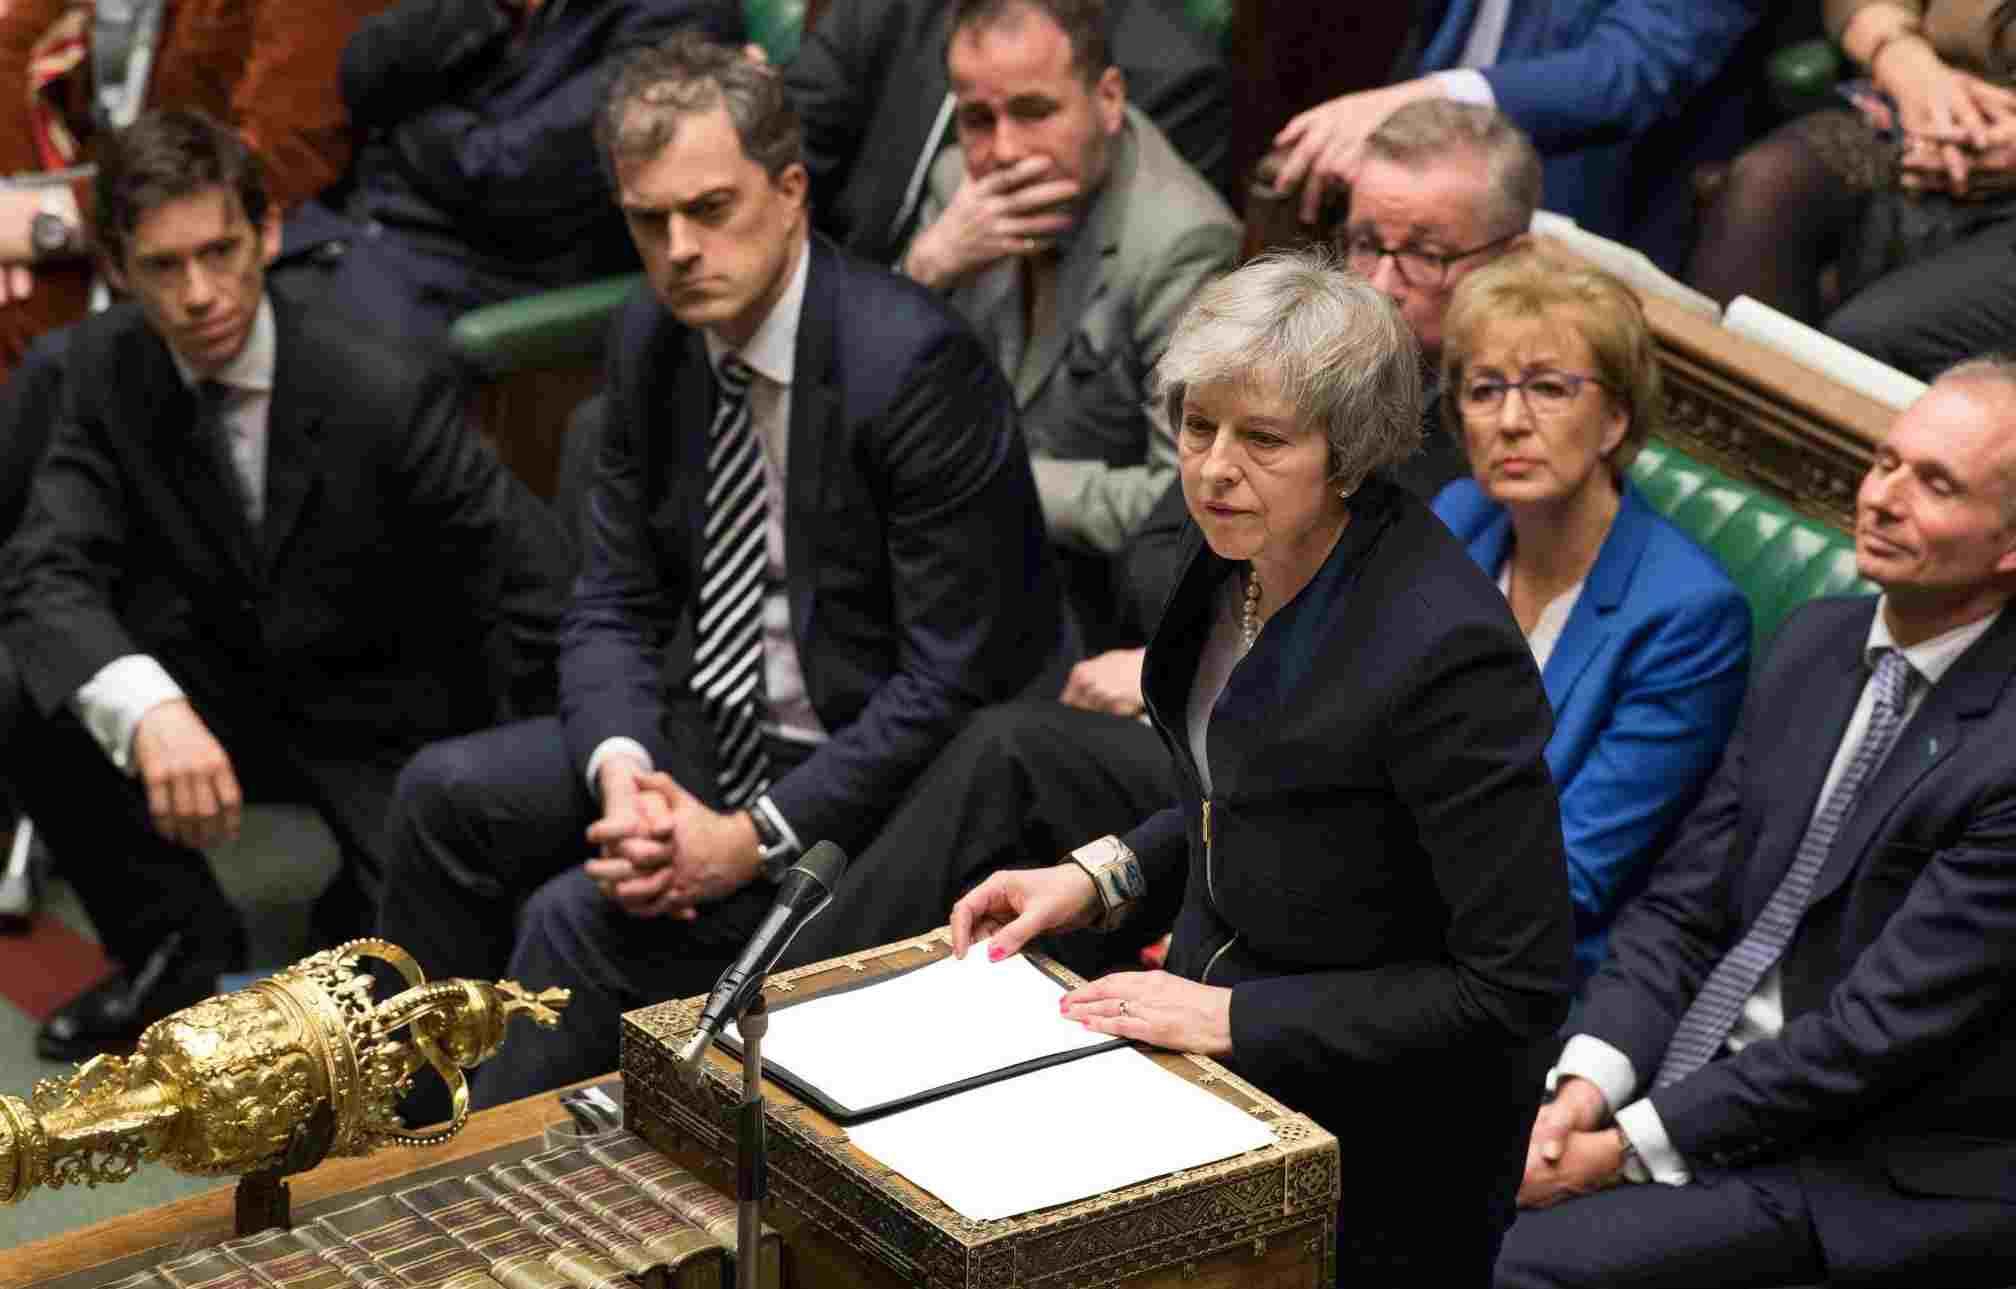 britisk_parlament_stemmer_nej_til_brexitaftale.jpg